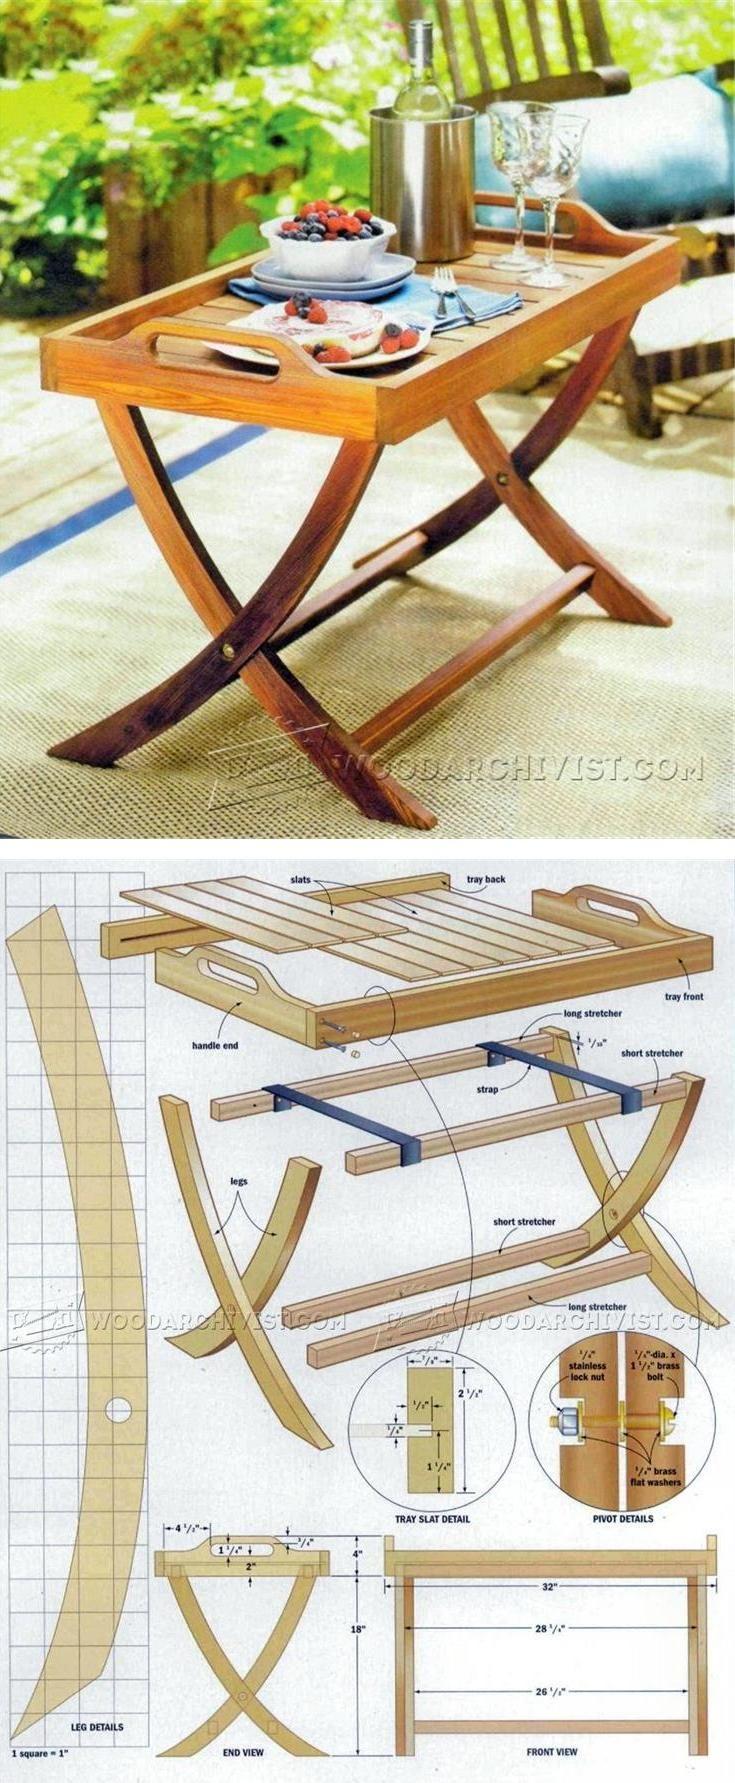 Best 25 Tray tables ideas on Pinterest